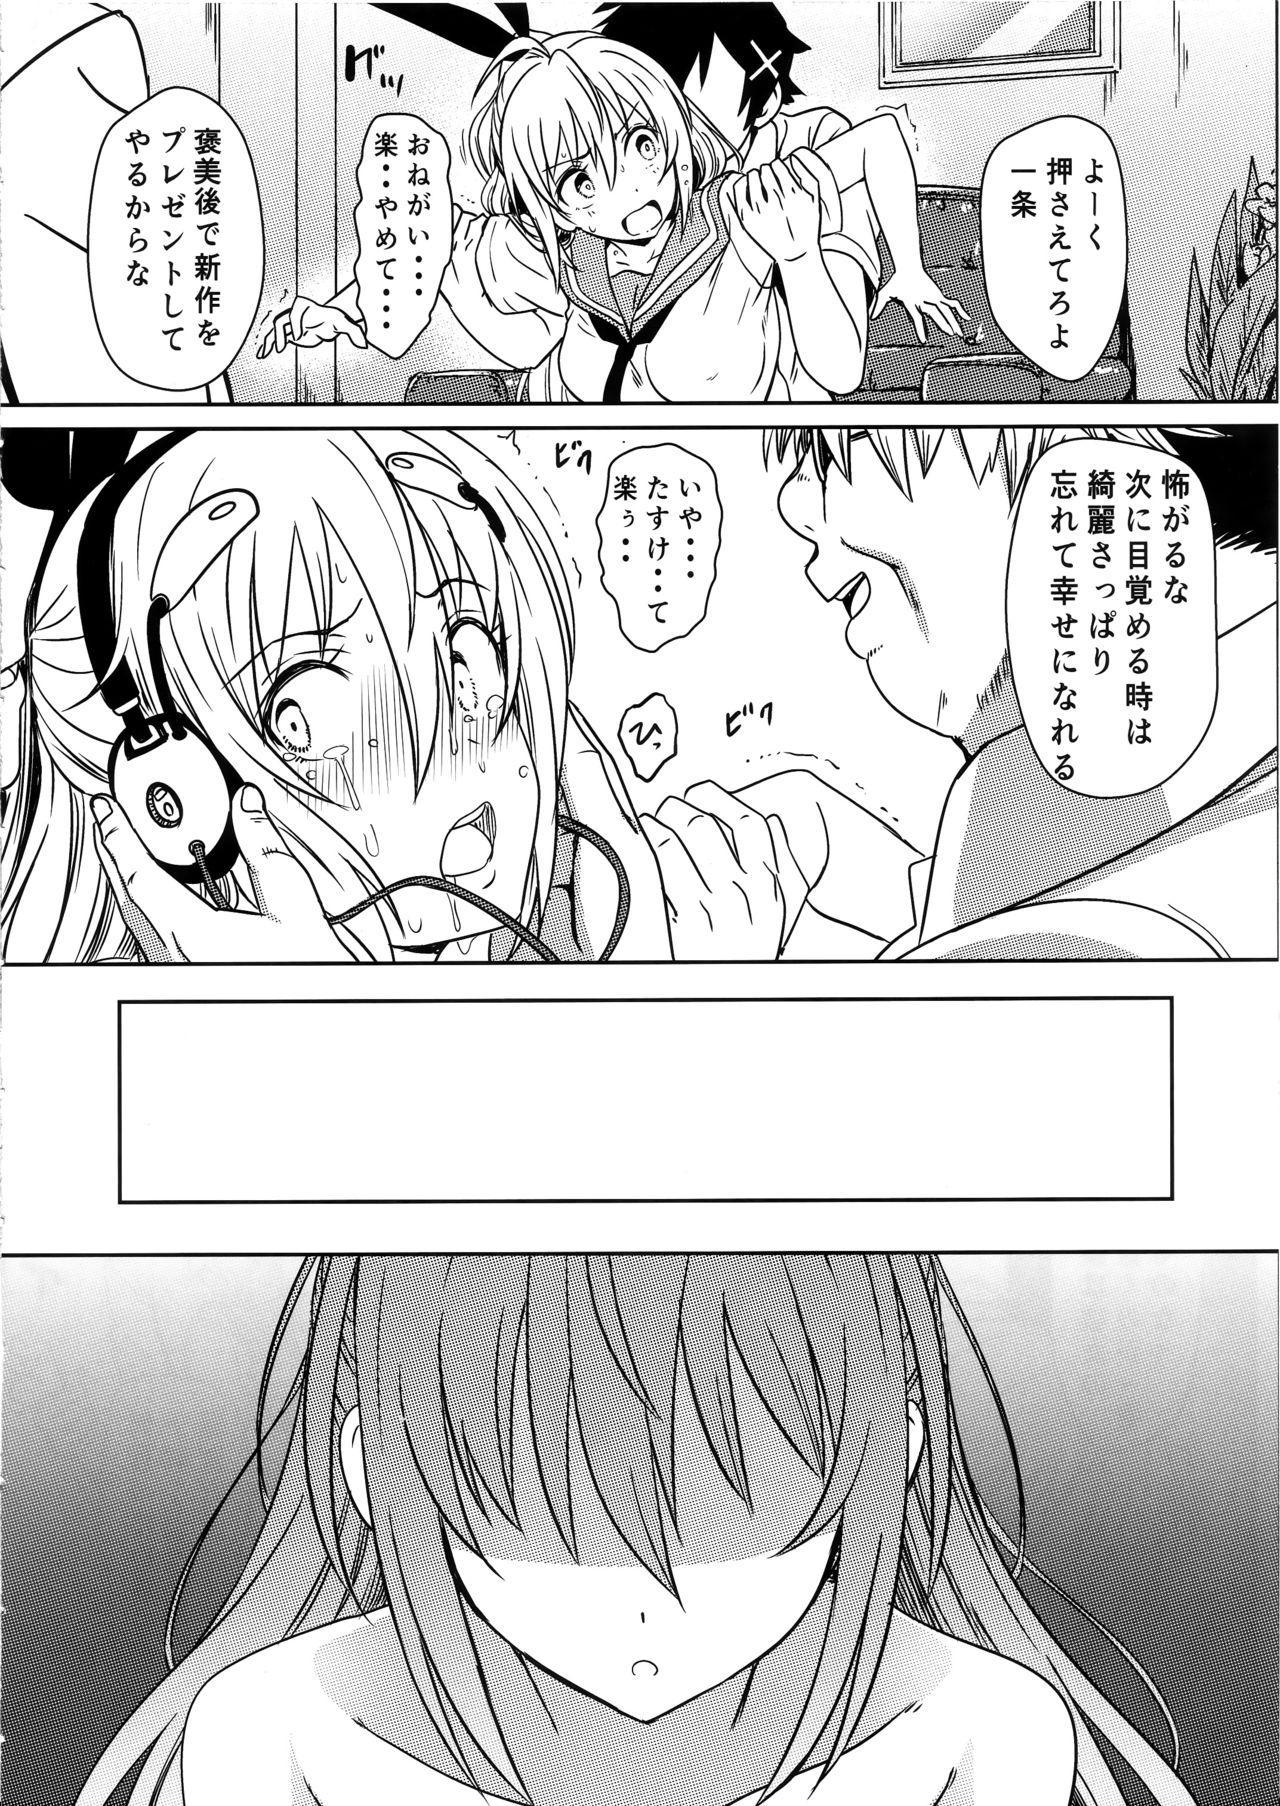 (C96) [Kaminari-neko (Eitarou)] Yamikoi -Saimin- 4 (Nisekoi) 18